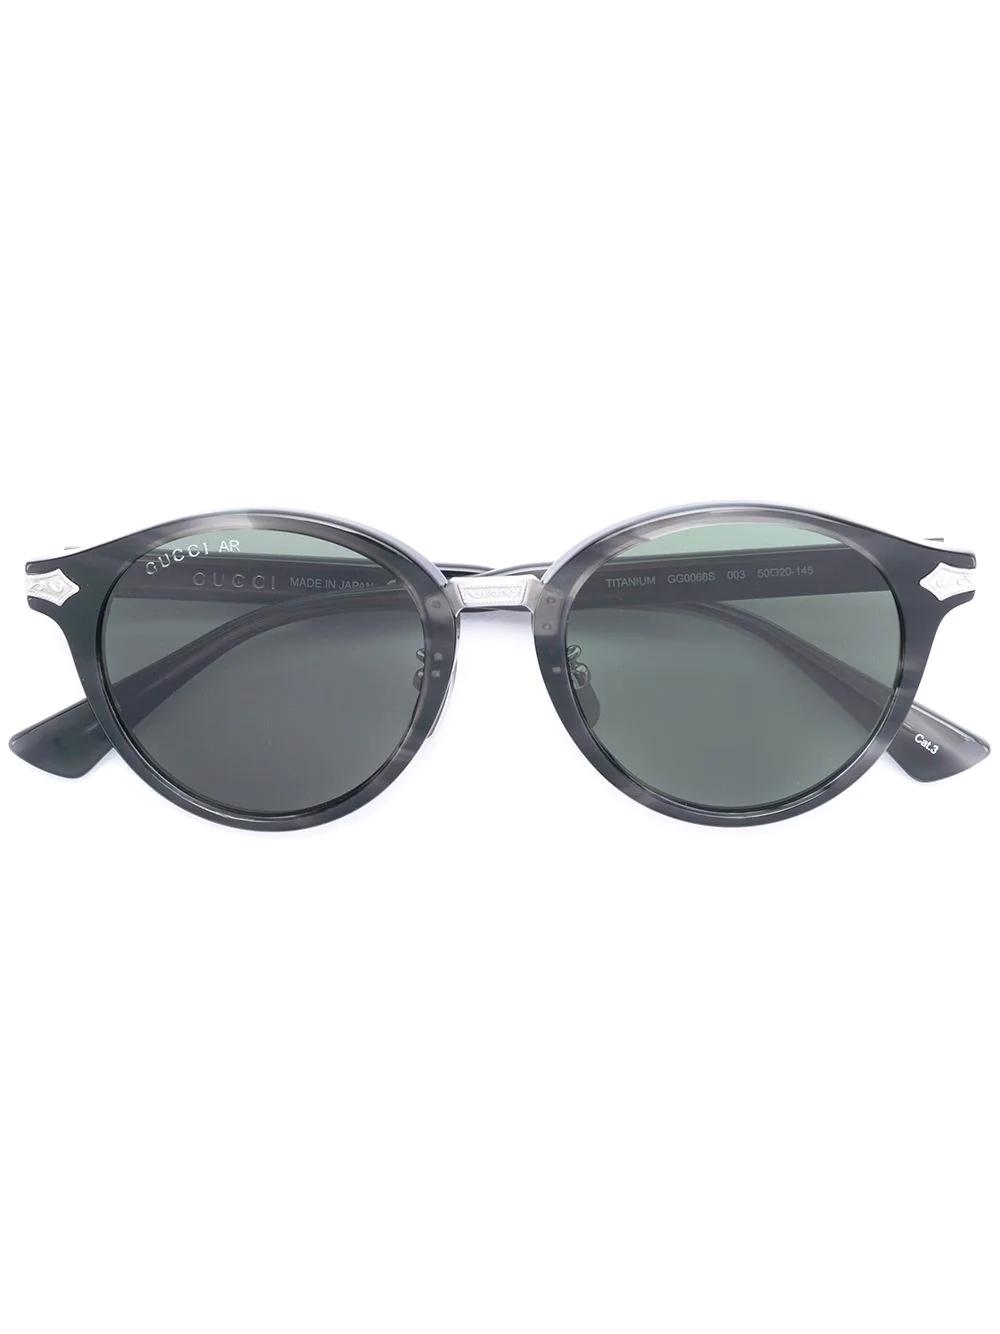 GUCCI | солнцезащитные очки с круглой оправой | Clouty